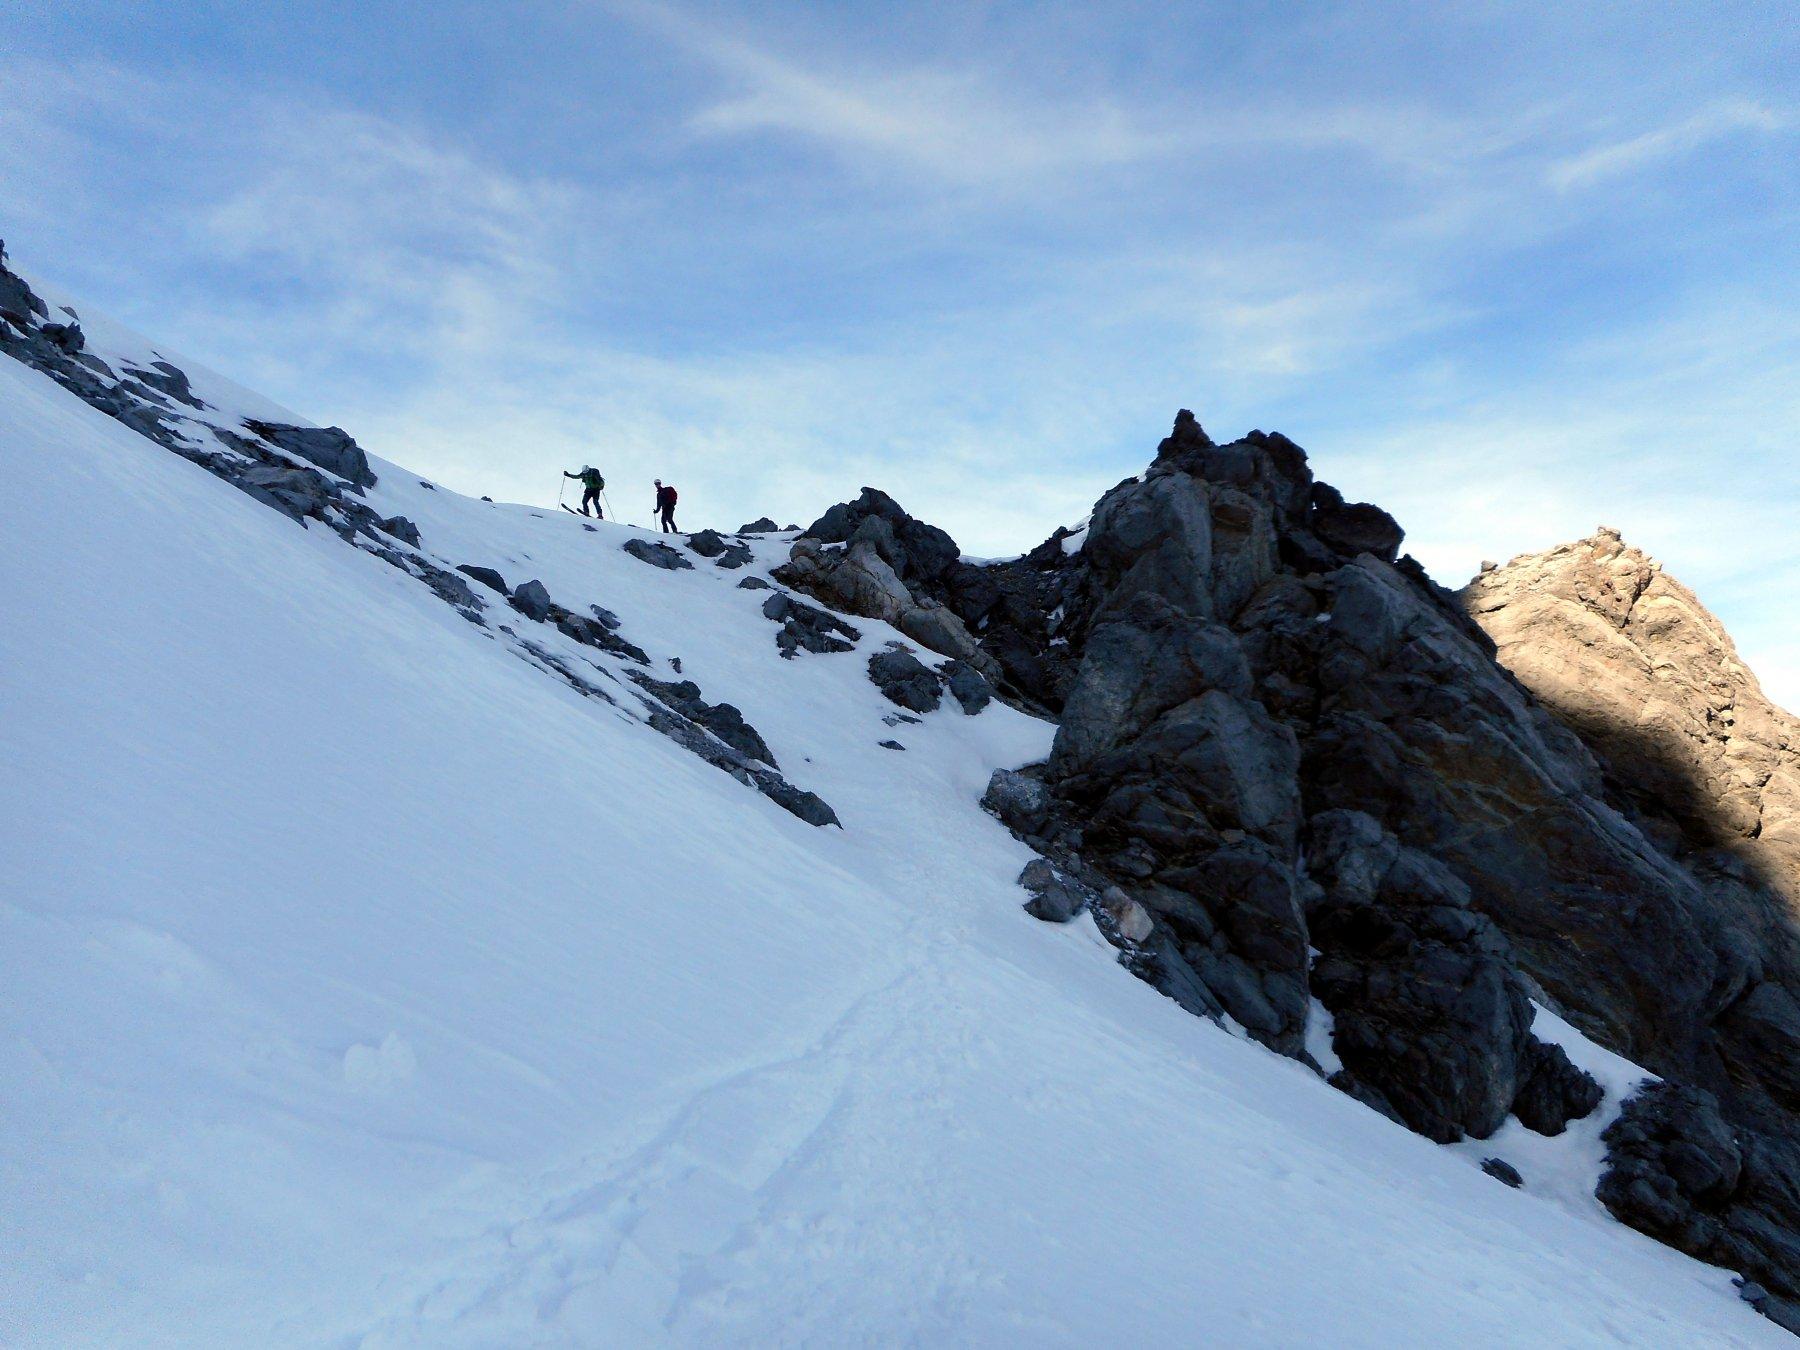 Desertes (Passo di) da Chateau Beaulard, giro della Punta Clotesse 2020-02-15